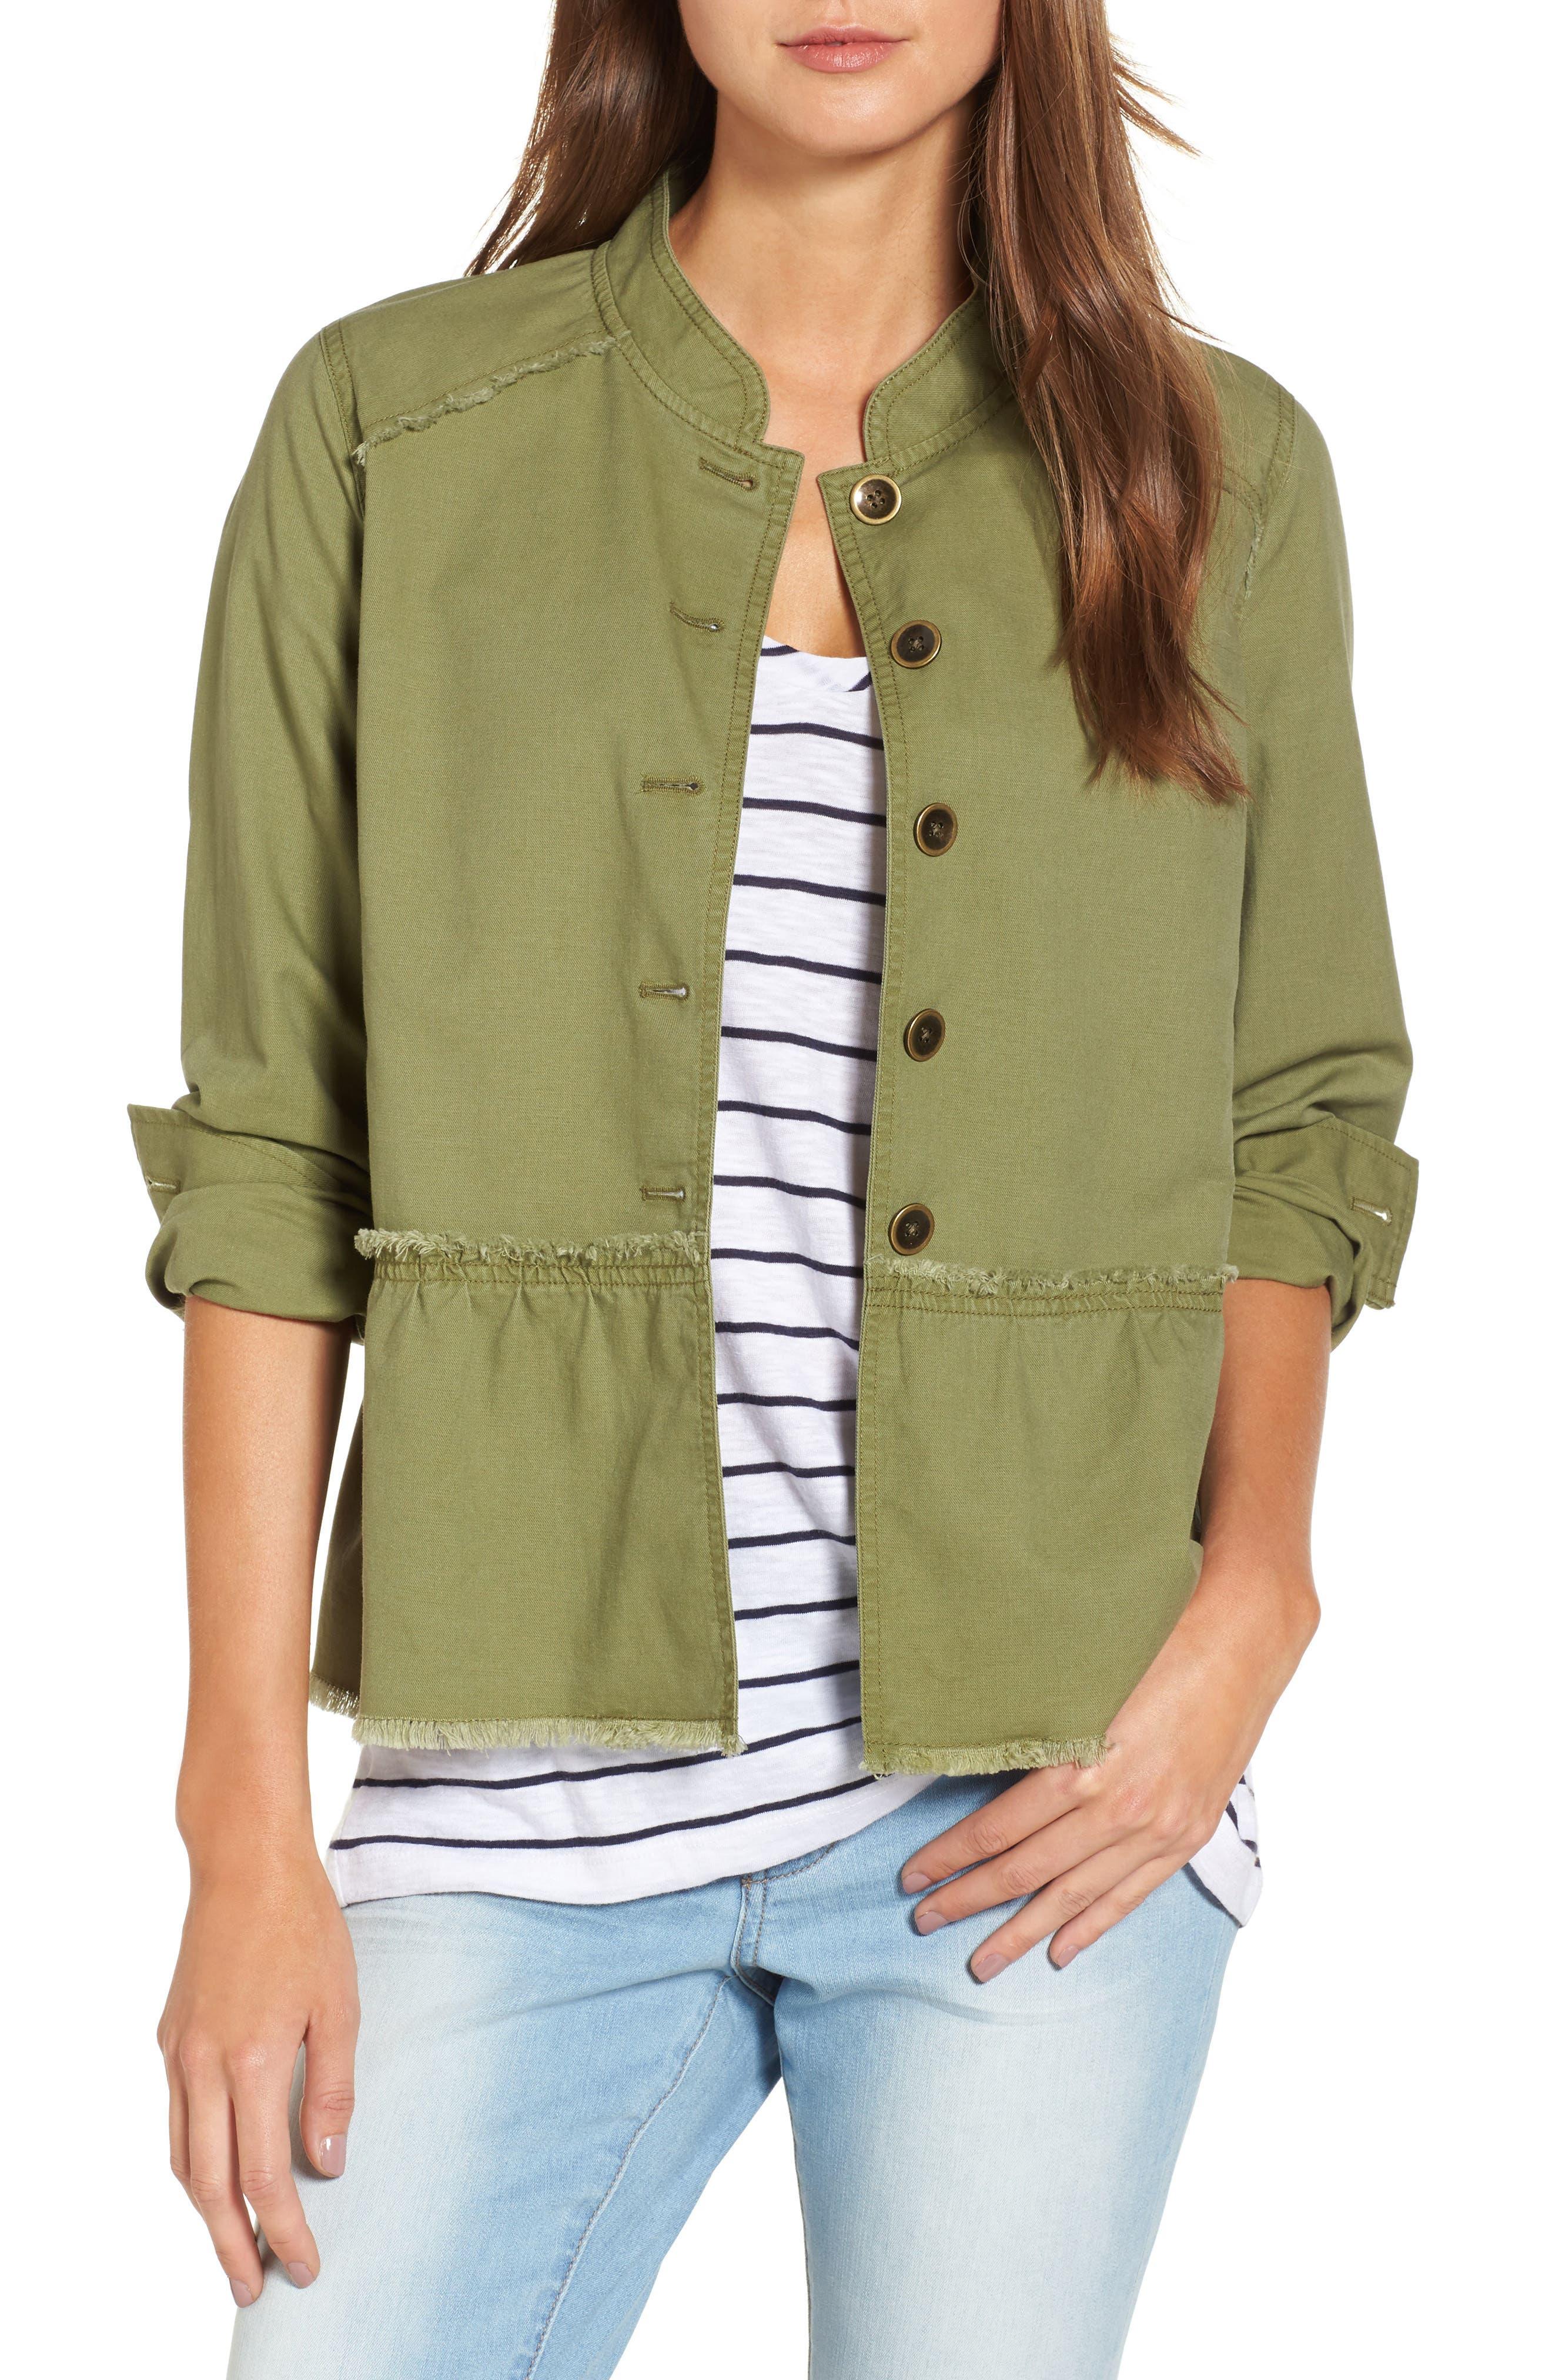 Alternate Image 1 Selected - Caslon® Twill Peplum Jacket (Regular & Petite)